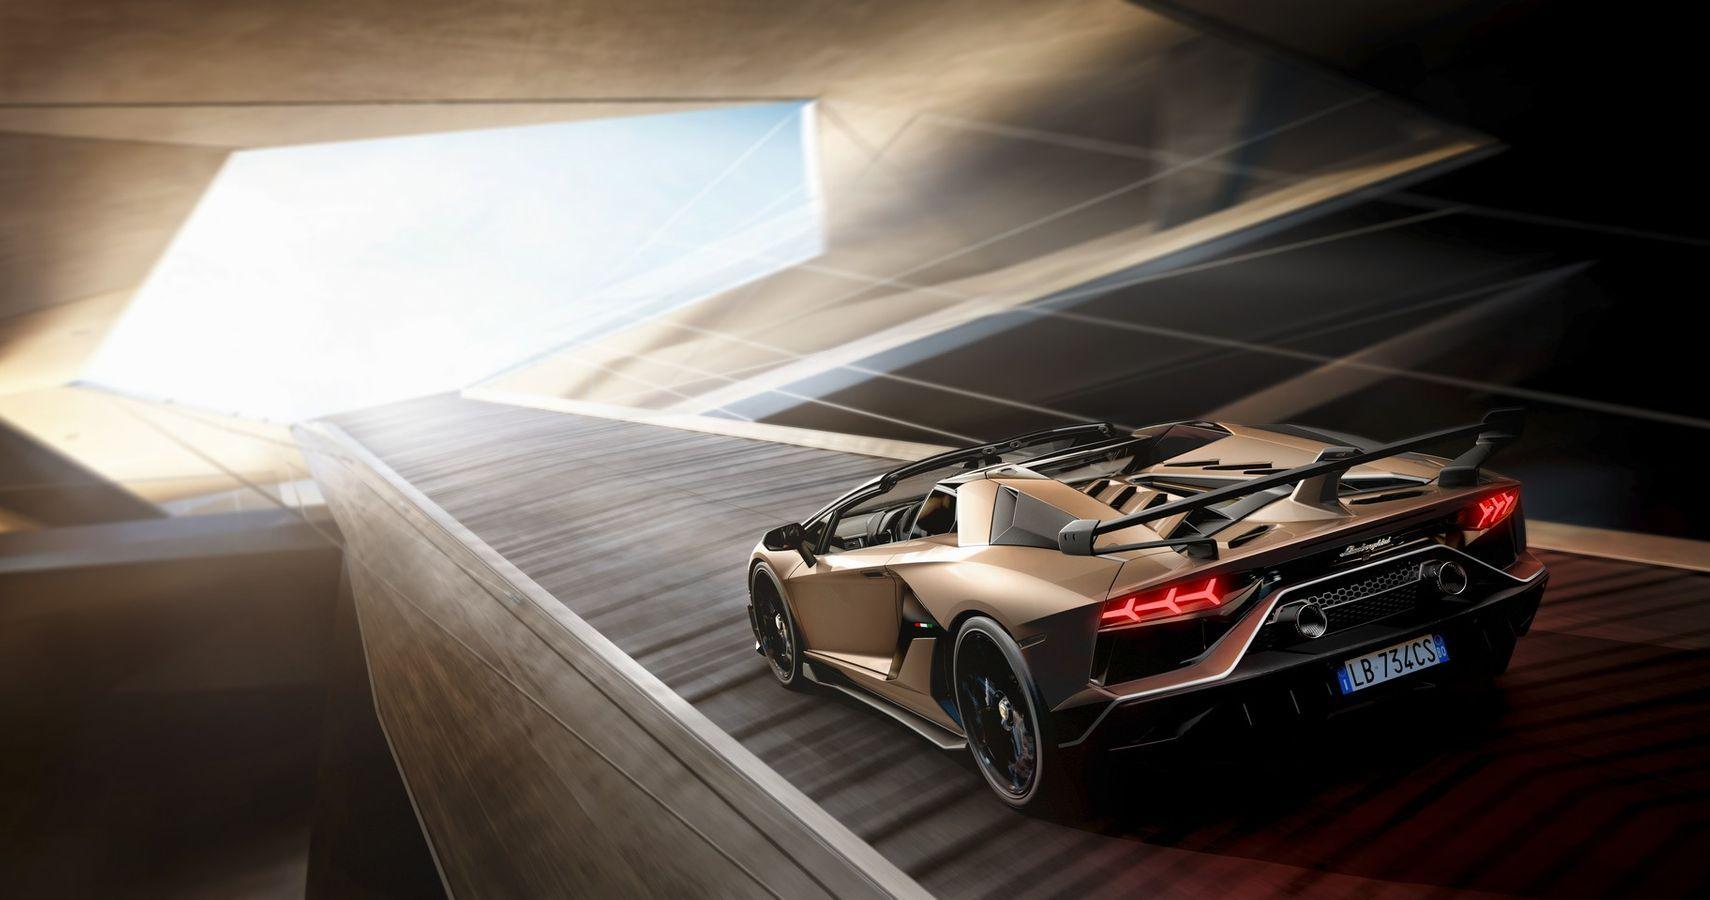 What We Know So Far About The Next-Gen Lamborghini Aventador